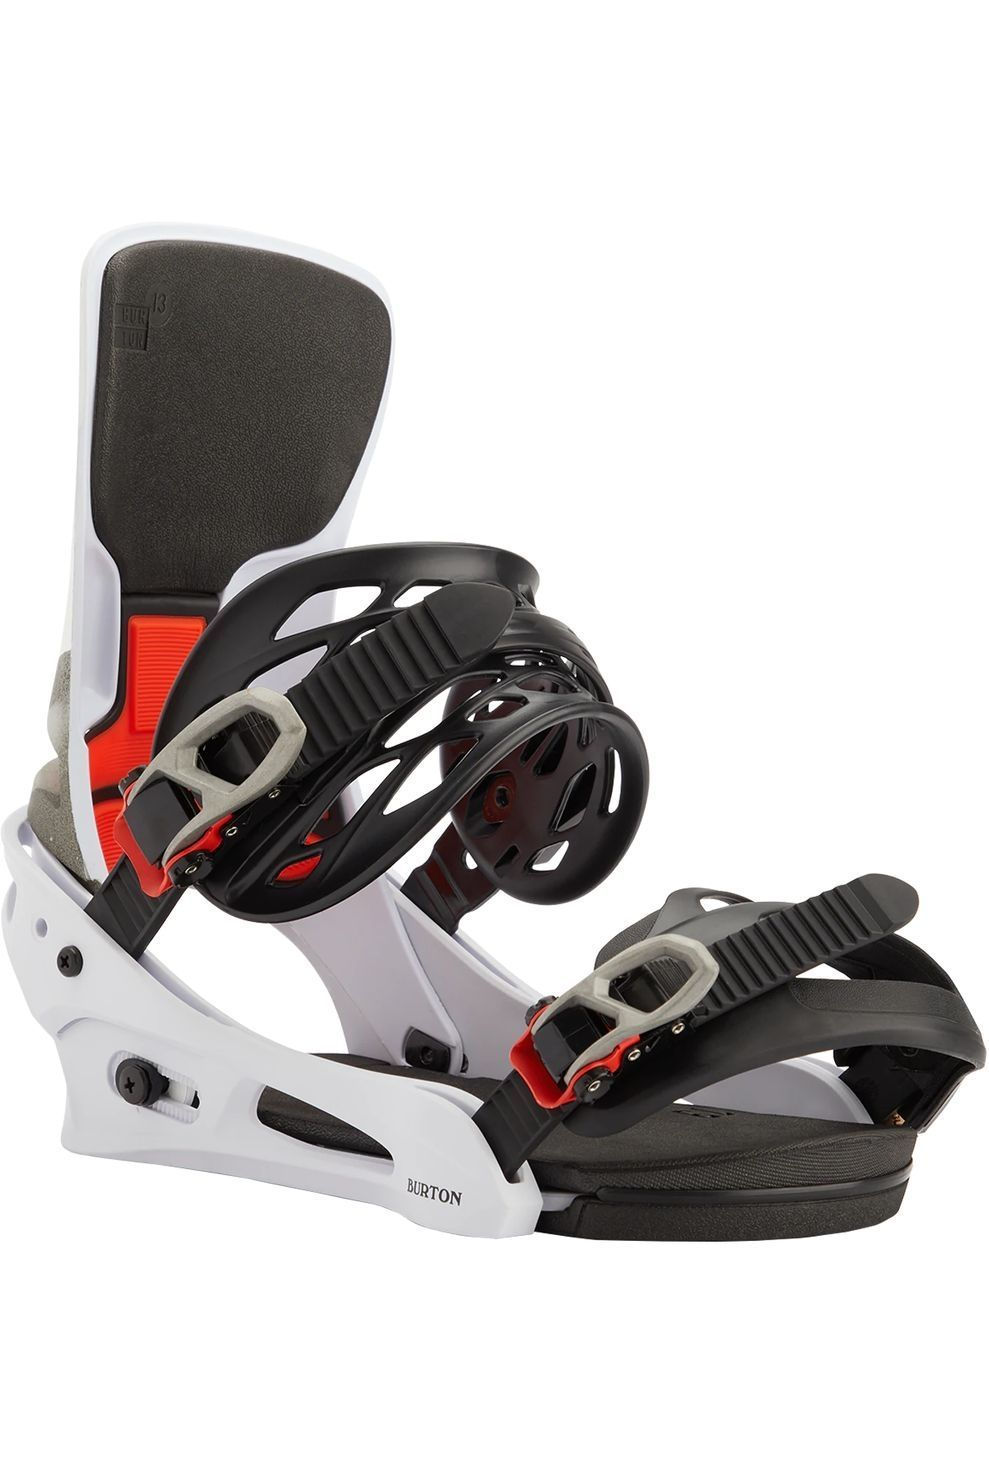 Burton Snowboardbinding Cartel X Reflex - Wit/Zwart - Maten: M, L